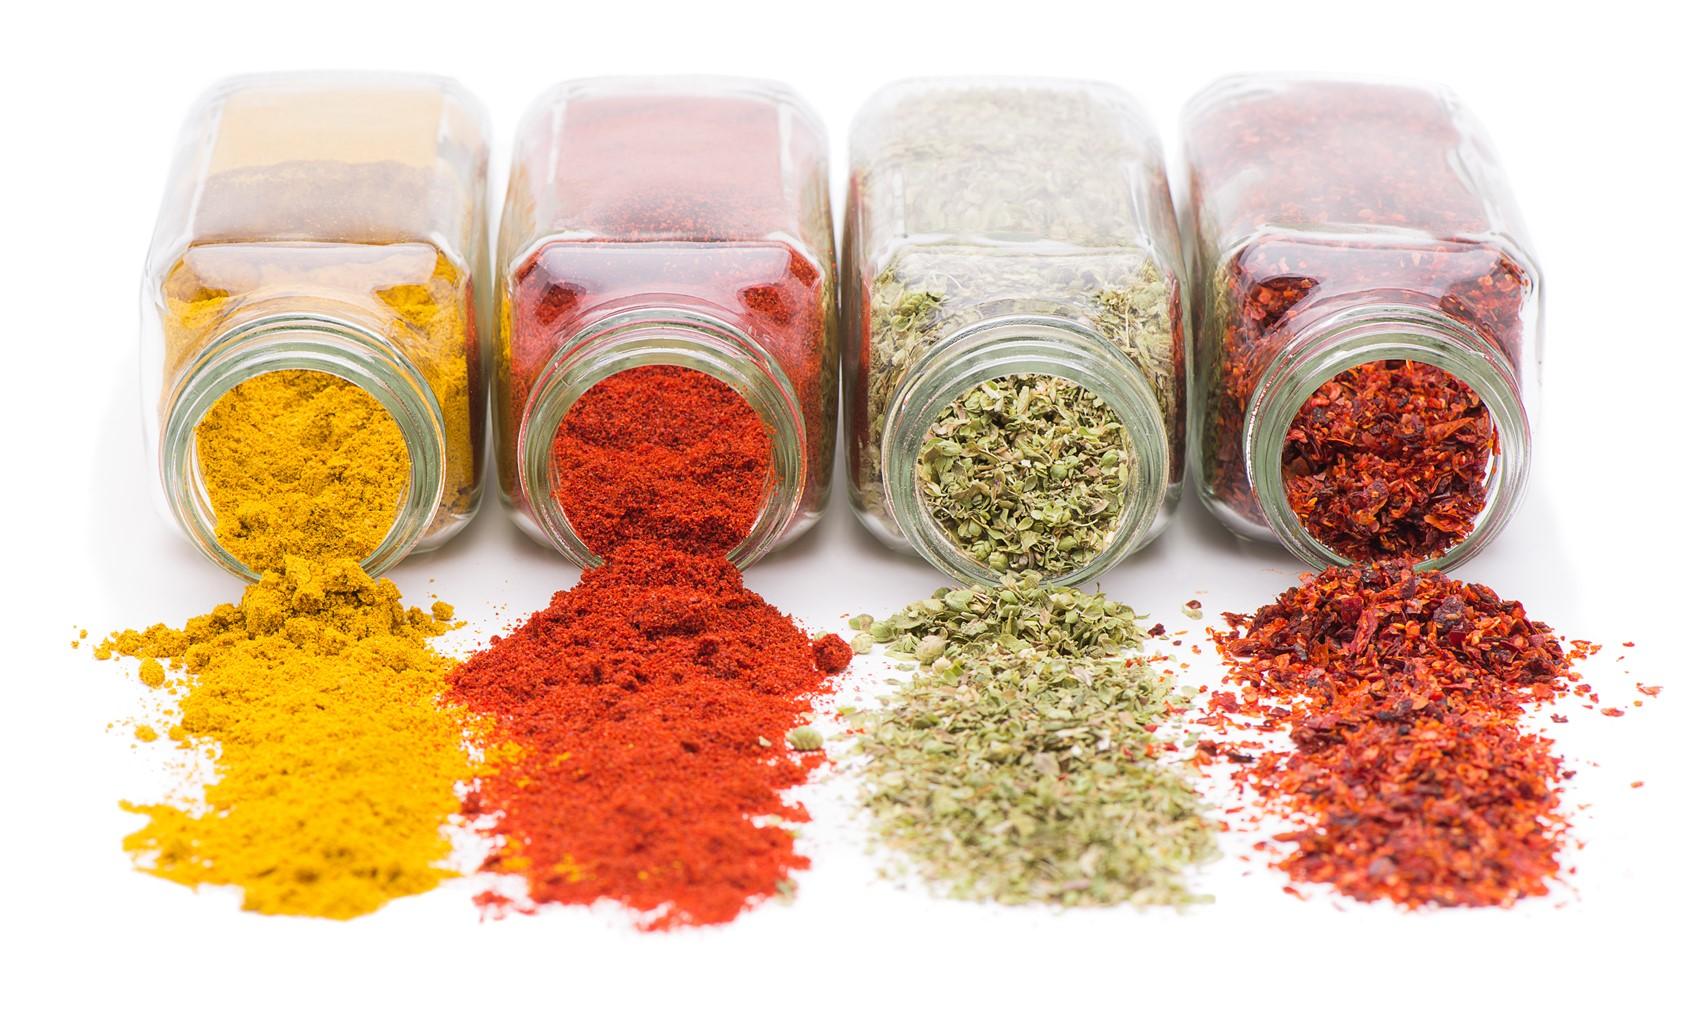 Spices shutterstock_160071875 (1706 x 1016)